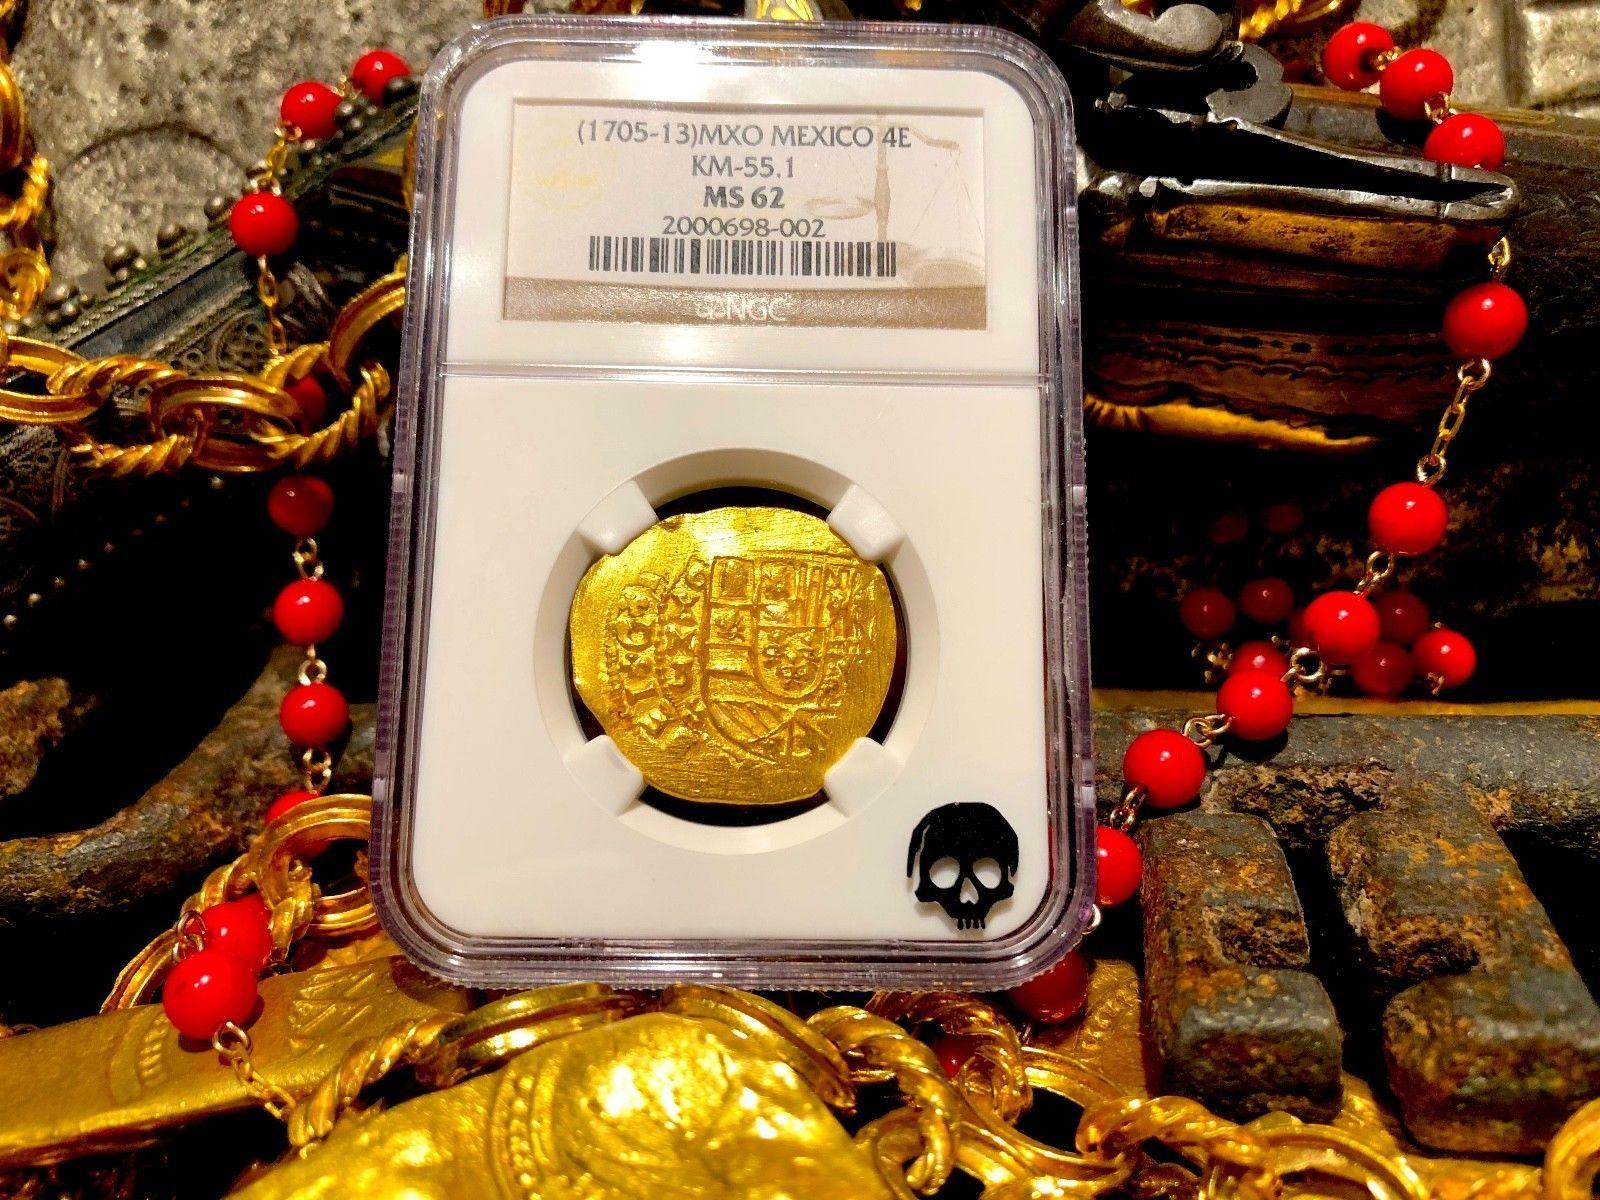 PIRATE GOLD COIN SHIPWRECK TREASURE JEWELRY NECKLACE MEXICO ROYAL ESCUDOS COB